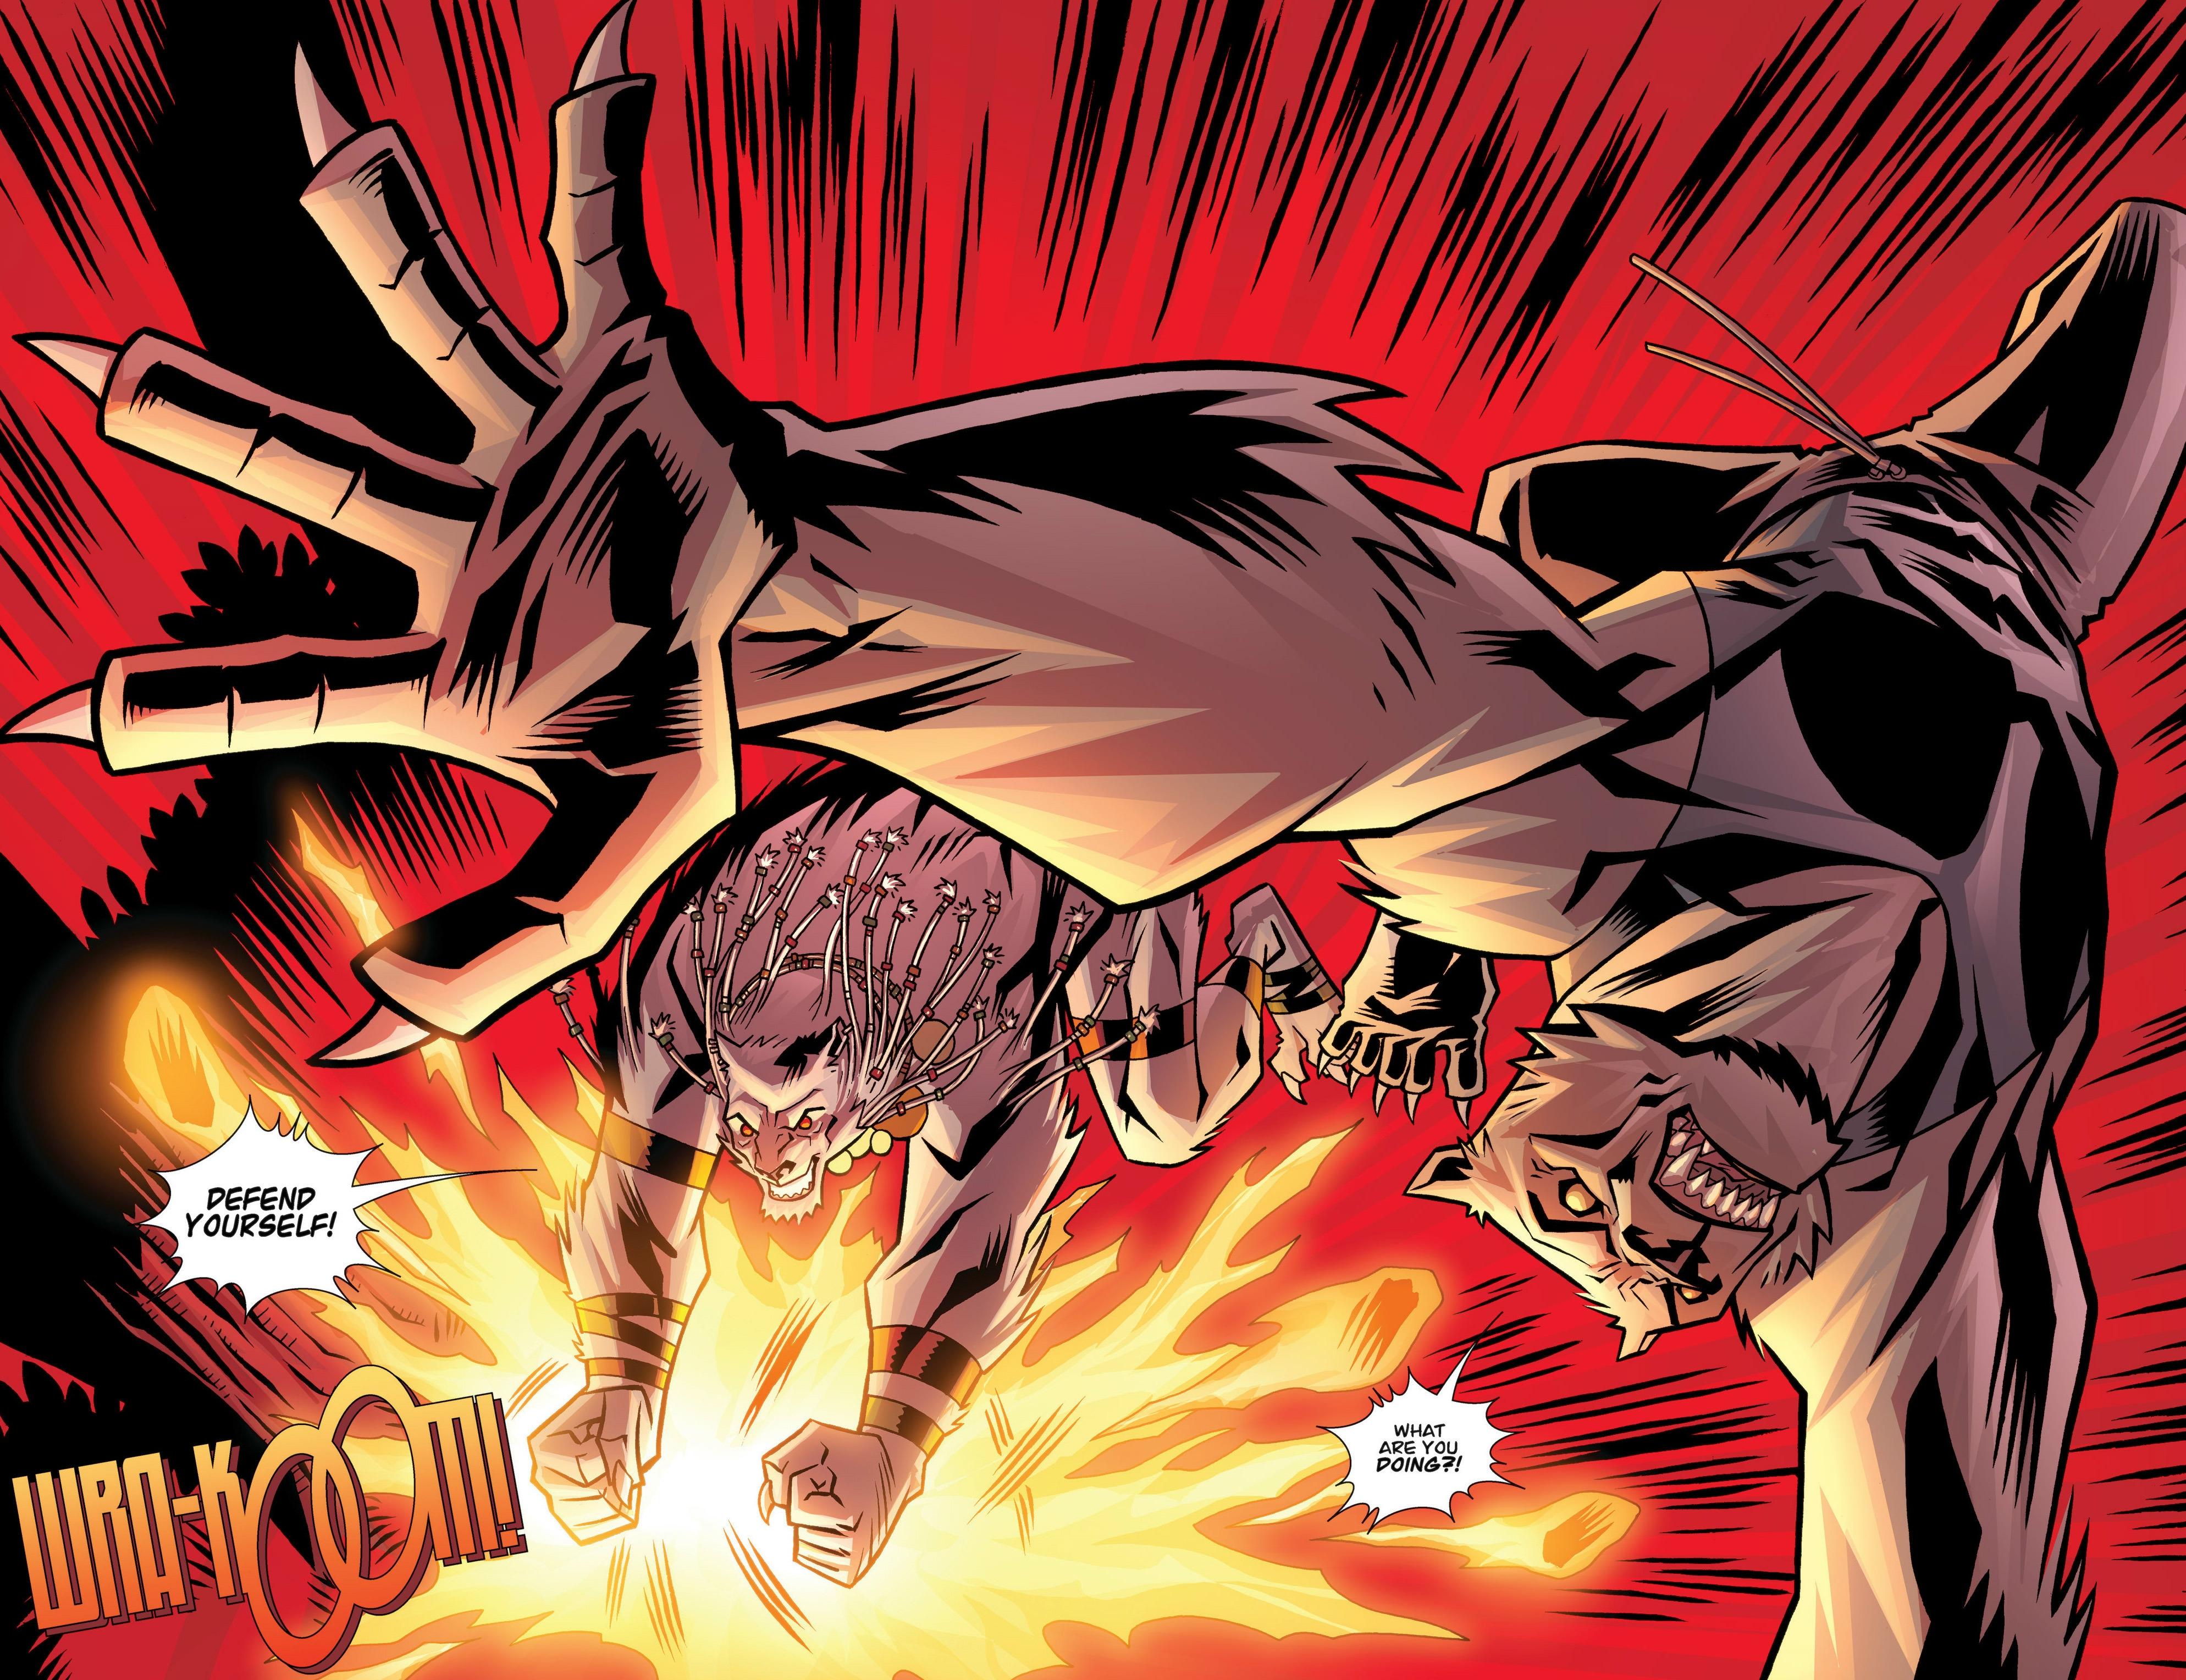 Astounding Wolf-Man Vol 1 9 001.jpg